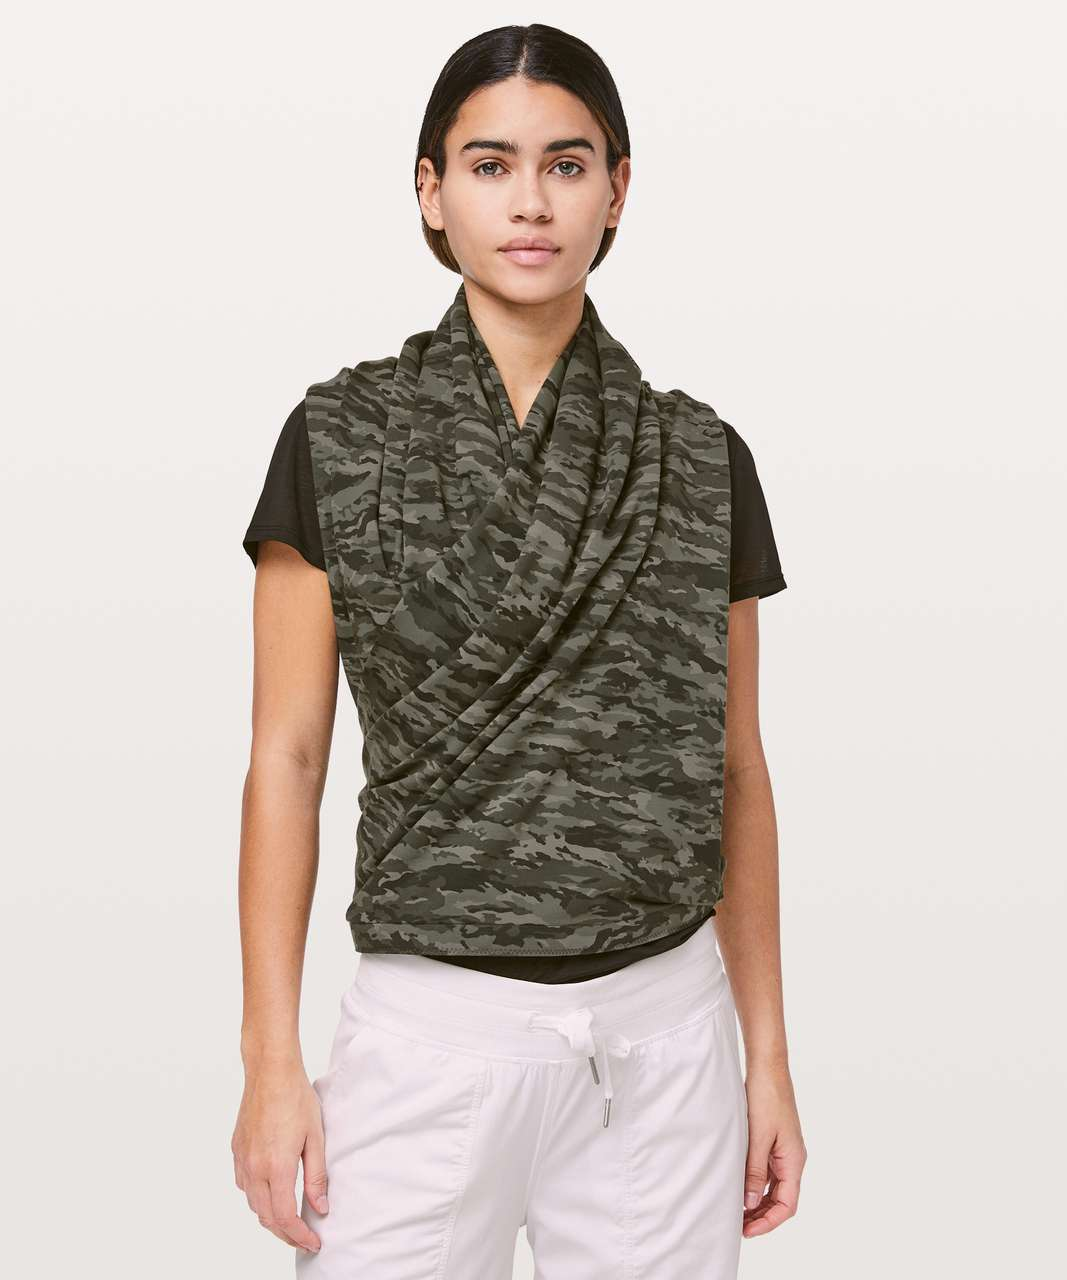 Lululemon Vinyasa Scarf *Cotton - Evergreen Camo Green Multi